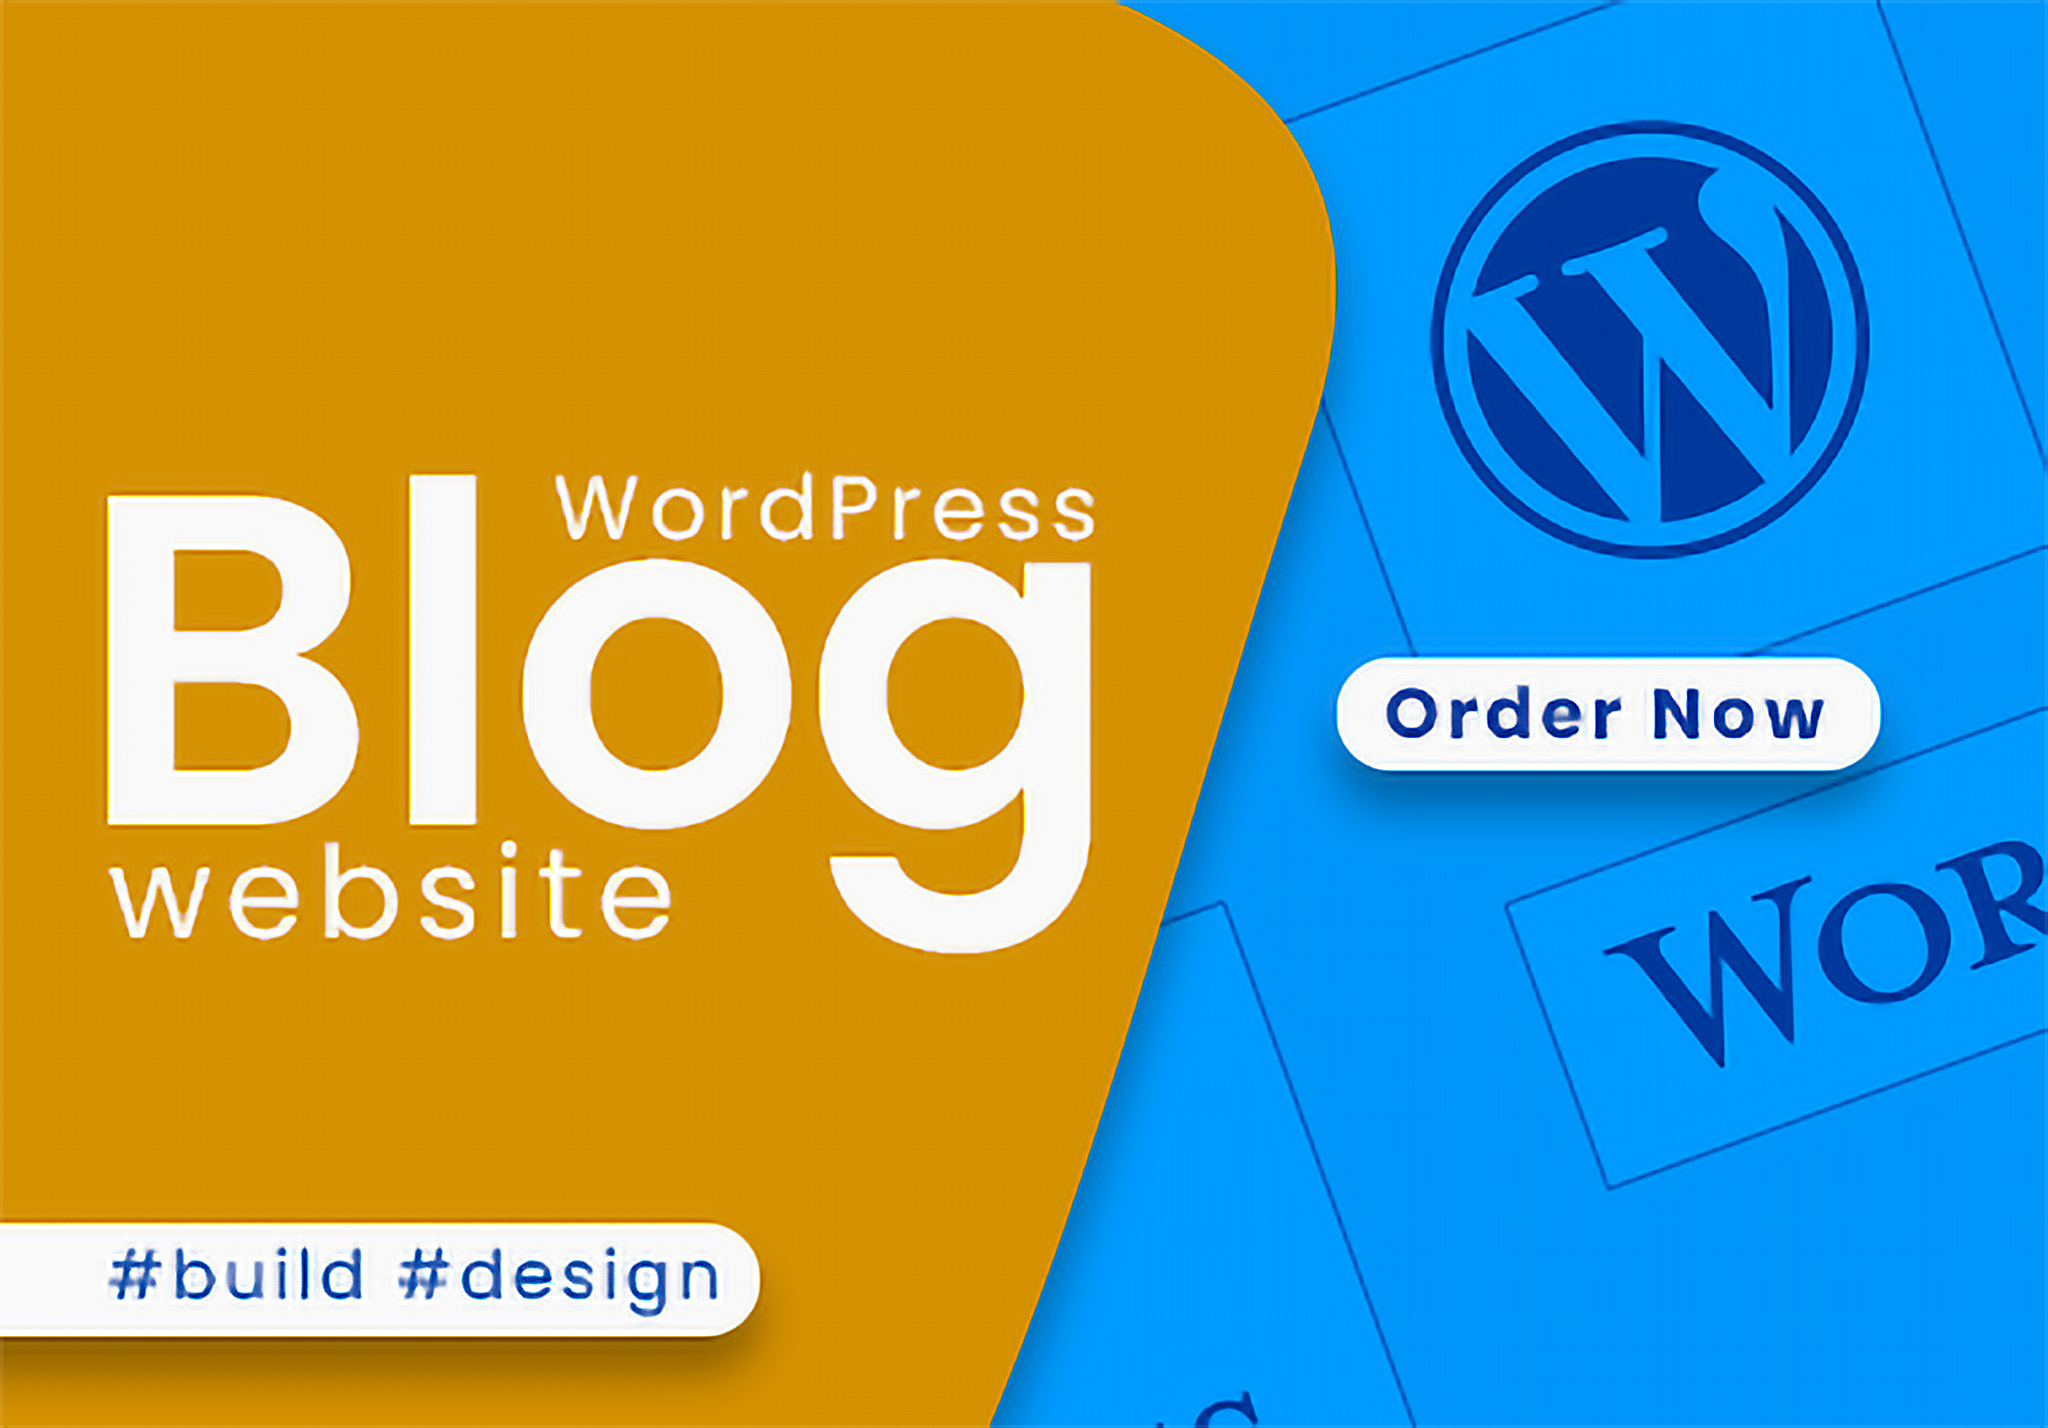 Create impressive wordpress blog website for you